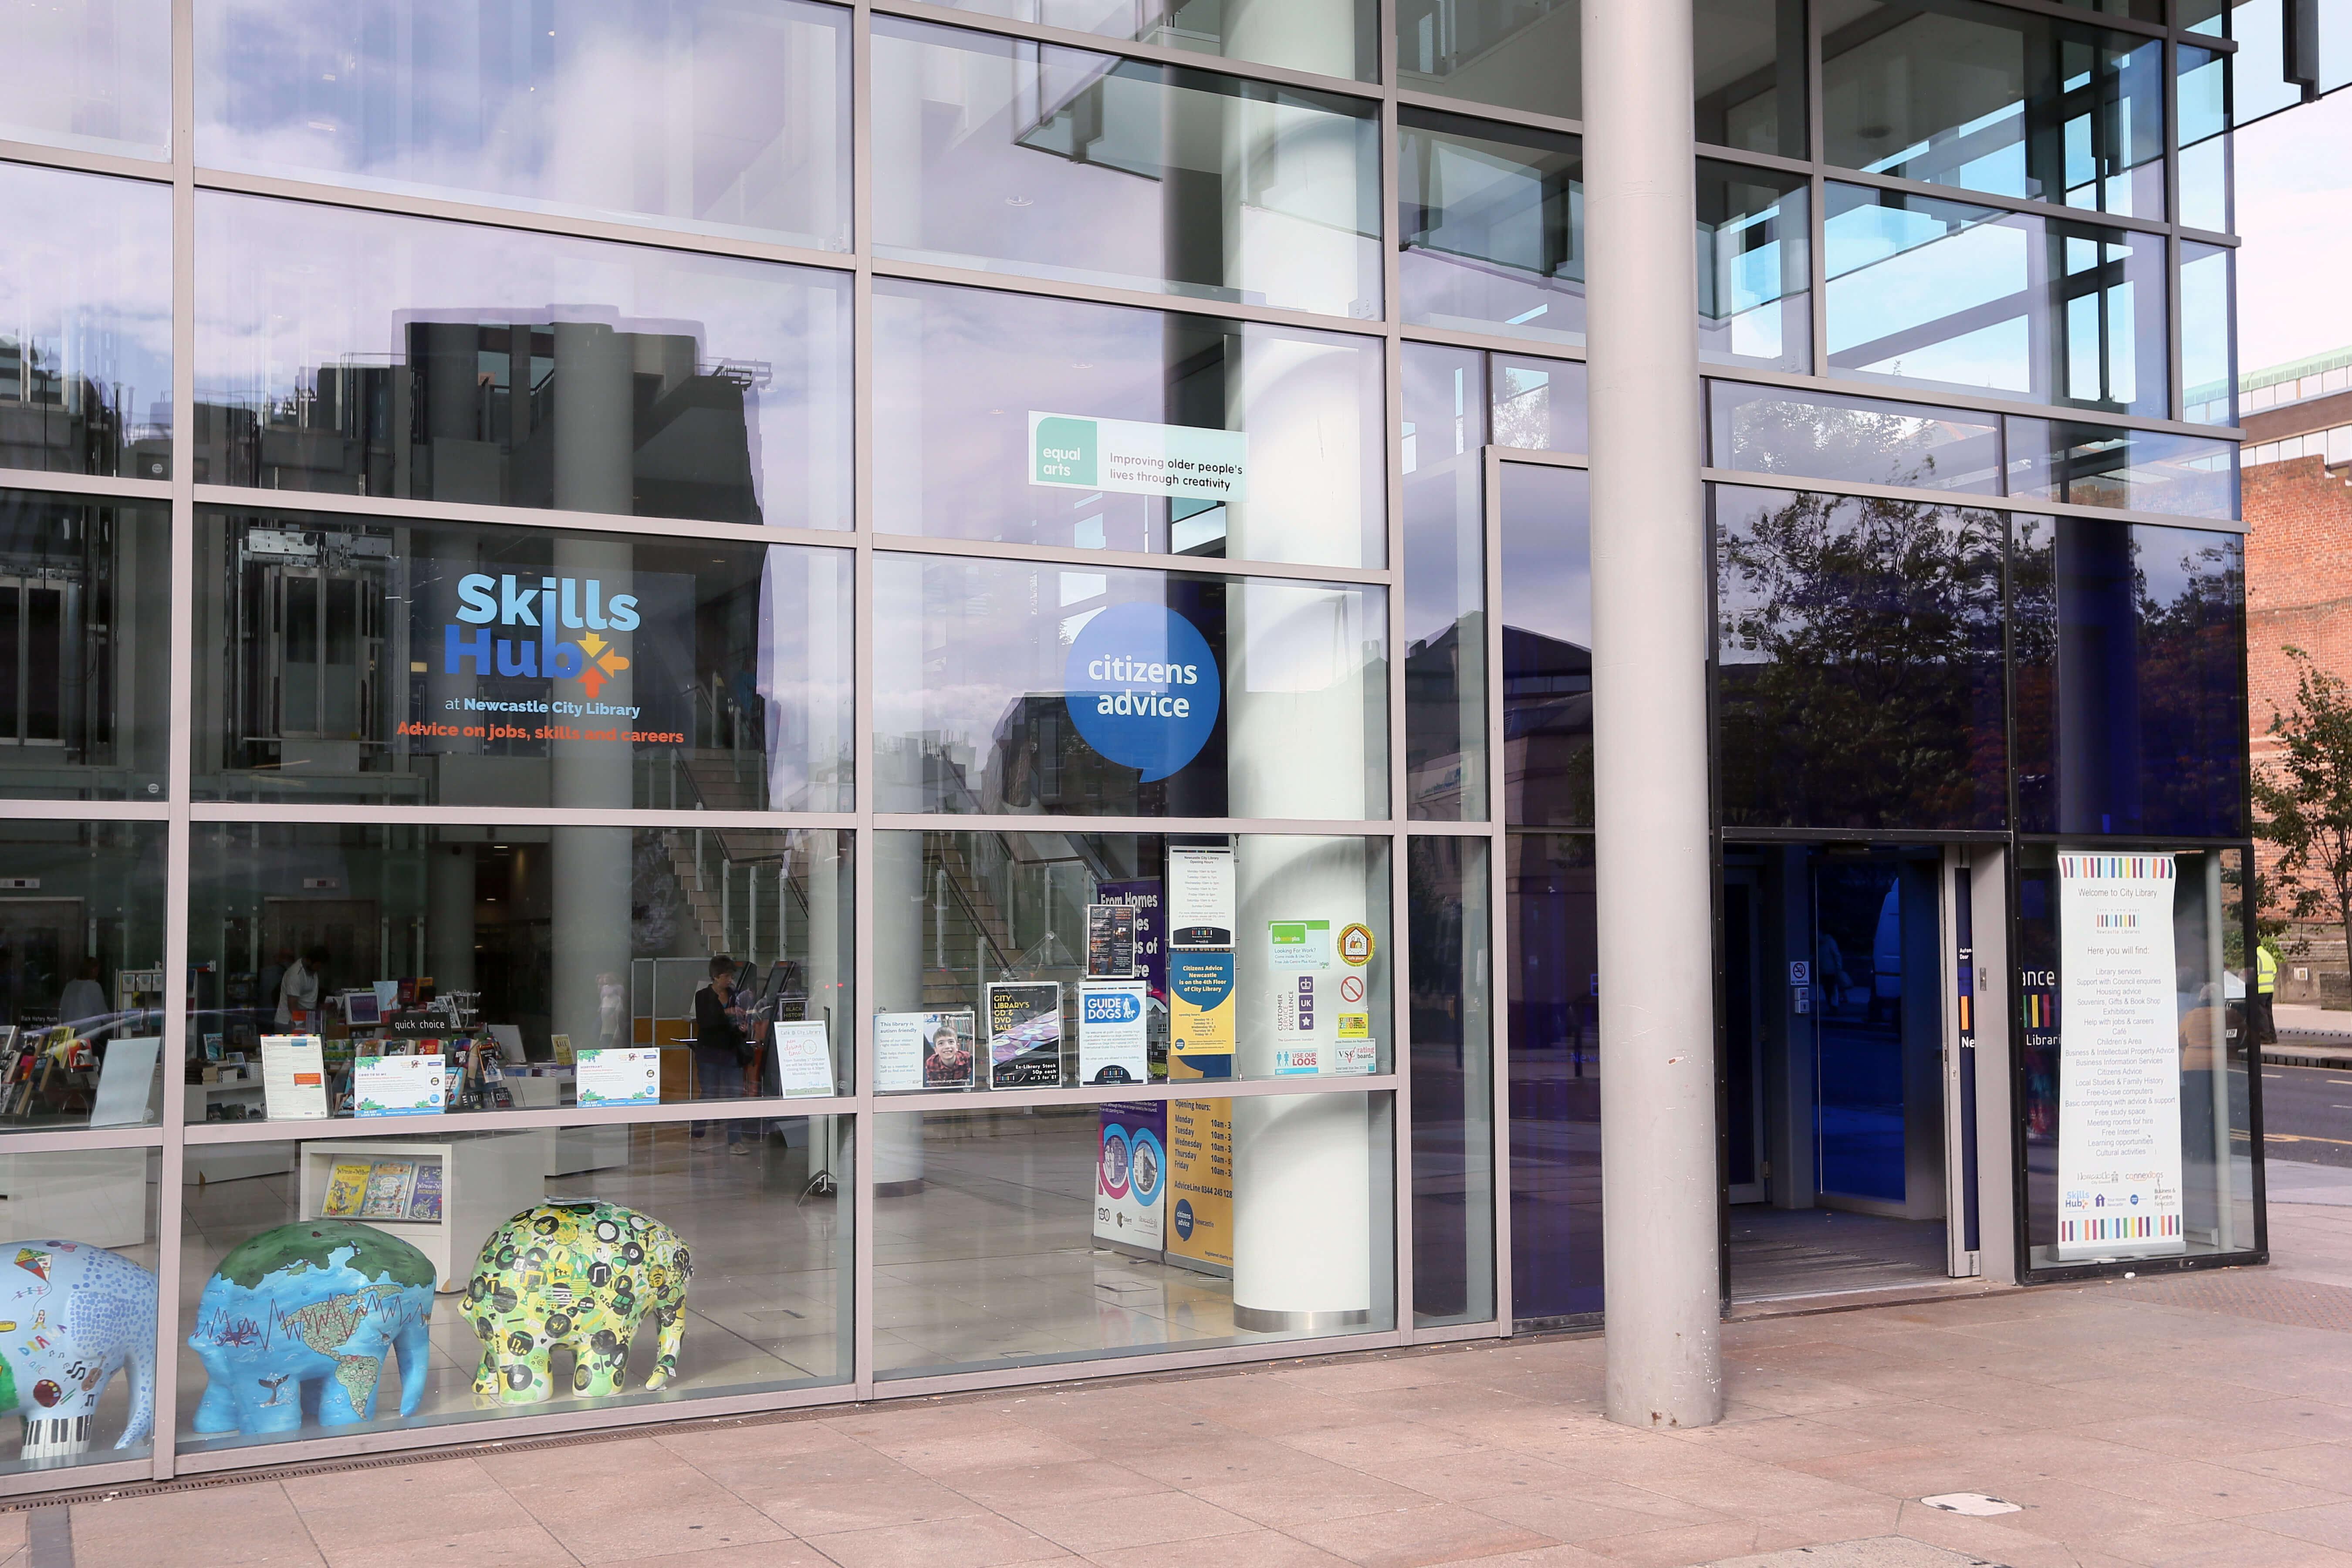 skills hub outside office